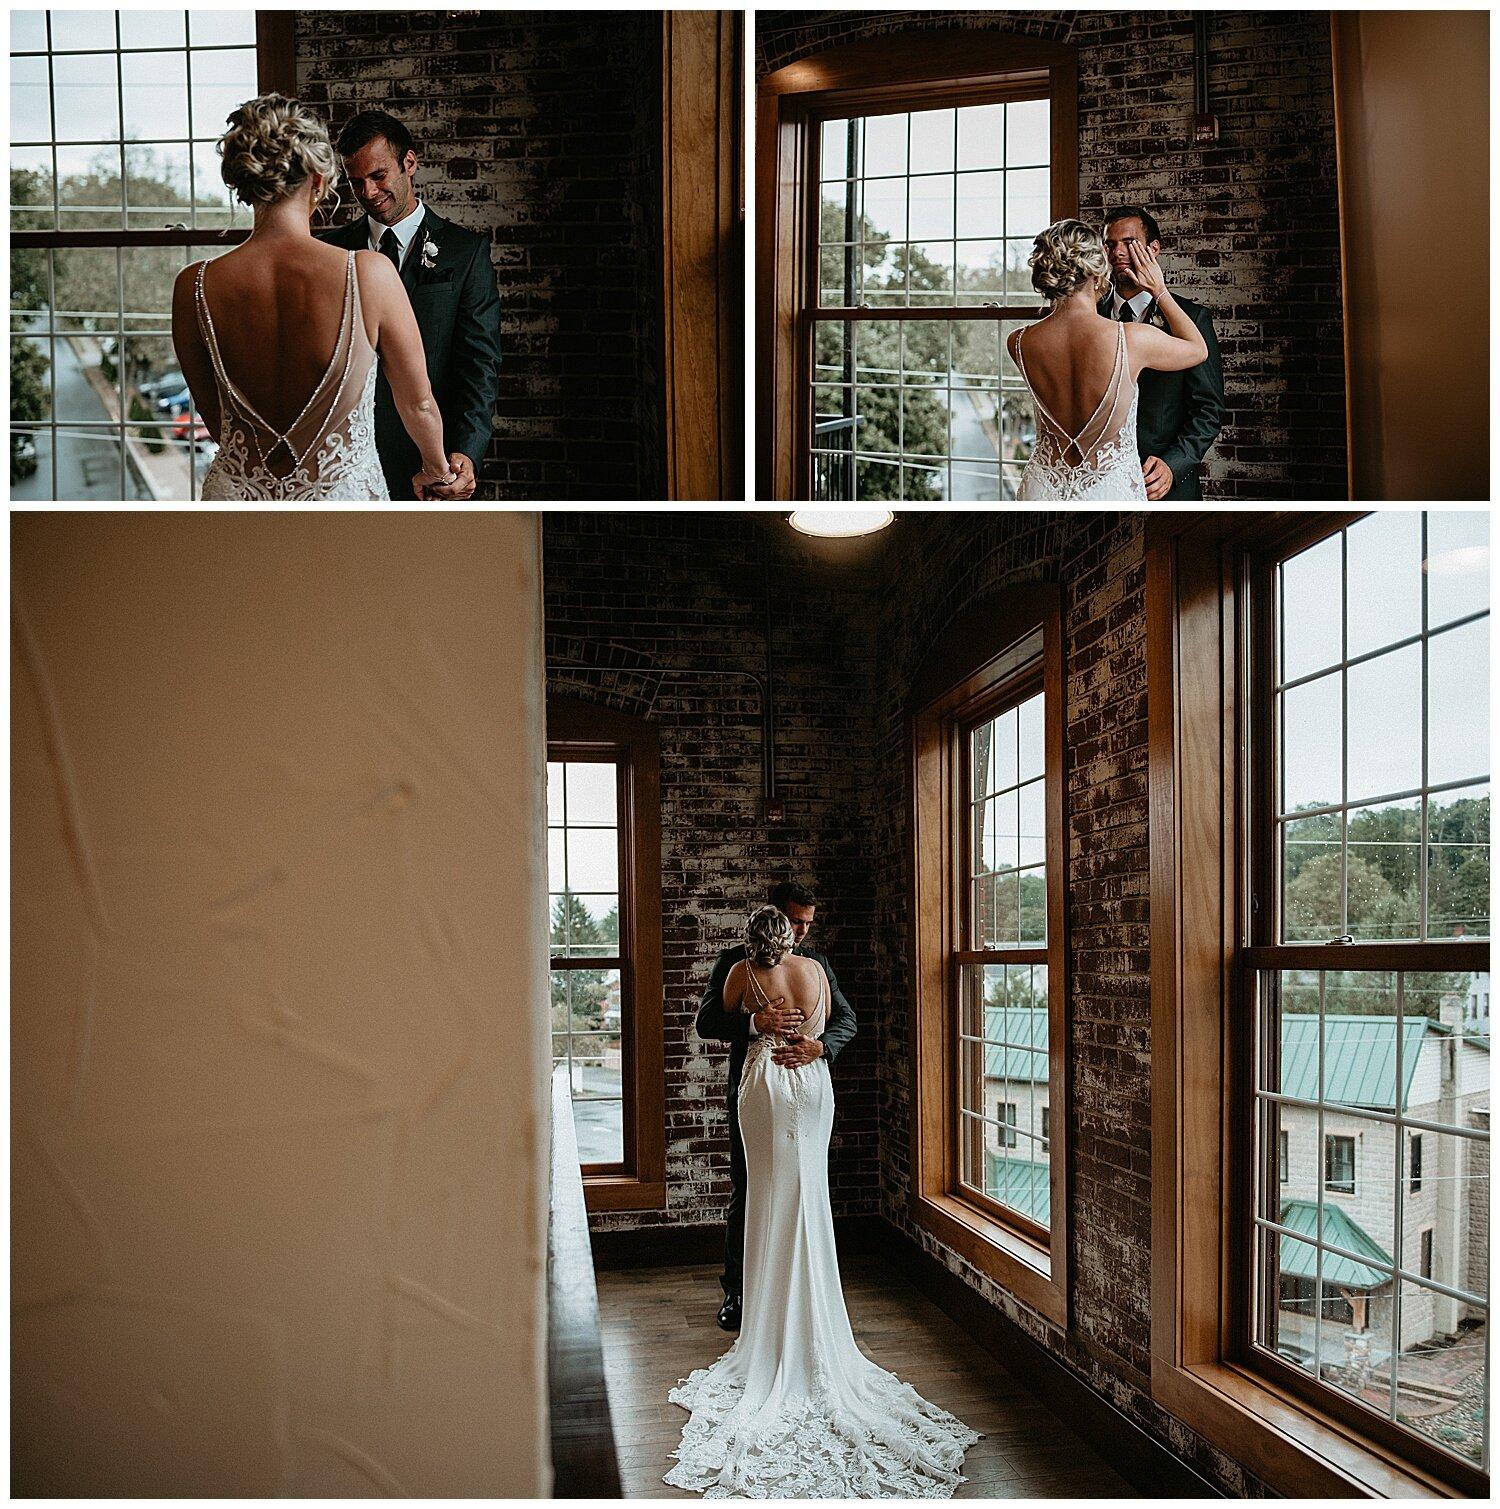 NEPA-Lewisburg-Wedding-Photographer-at-the-Rusty-Rail_0031.jpg